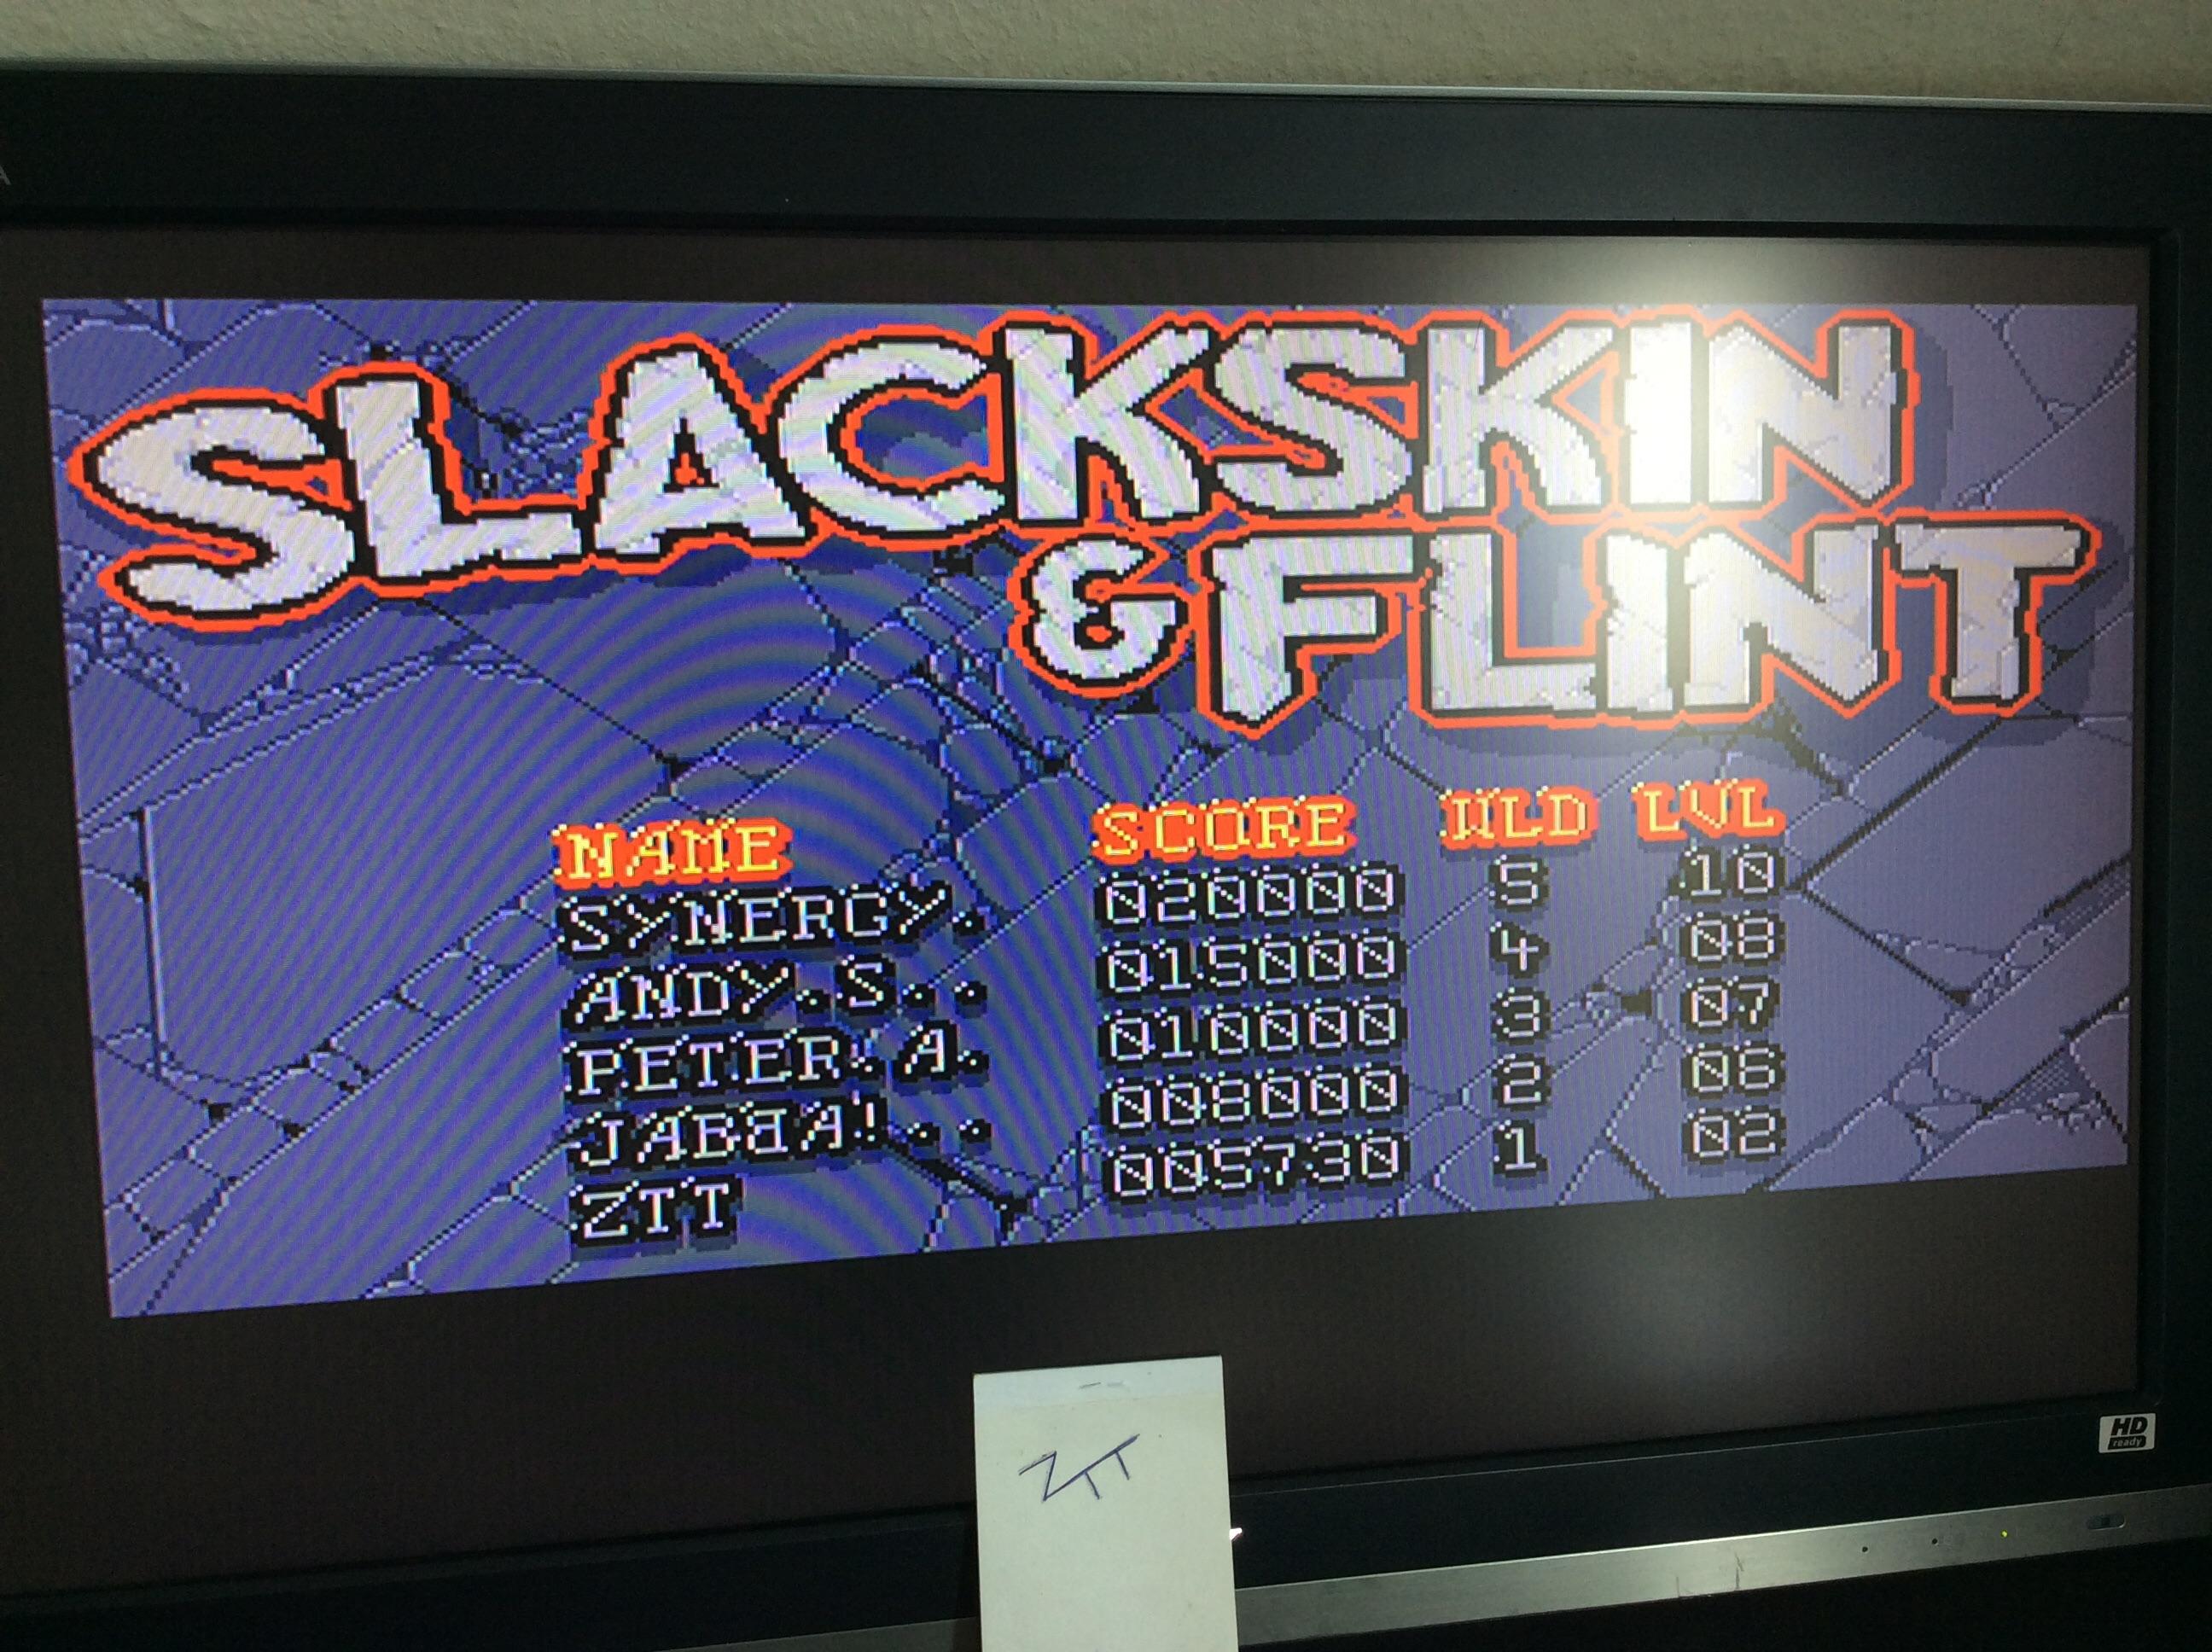 Frankie: Slackskin & Flint (Amiga) 5,730 points on 2016-10-29 06:21:25